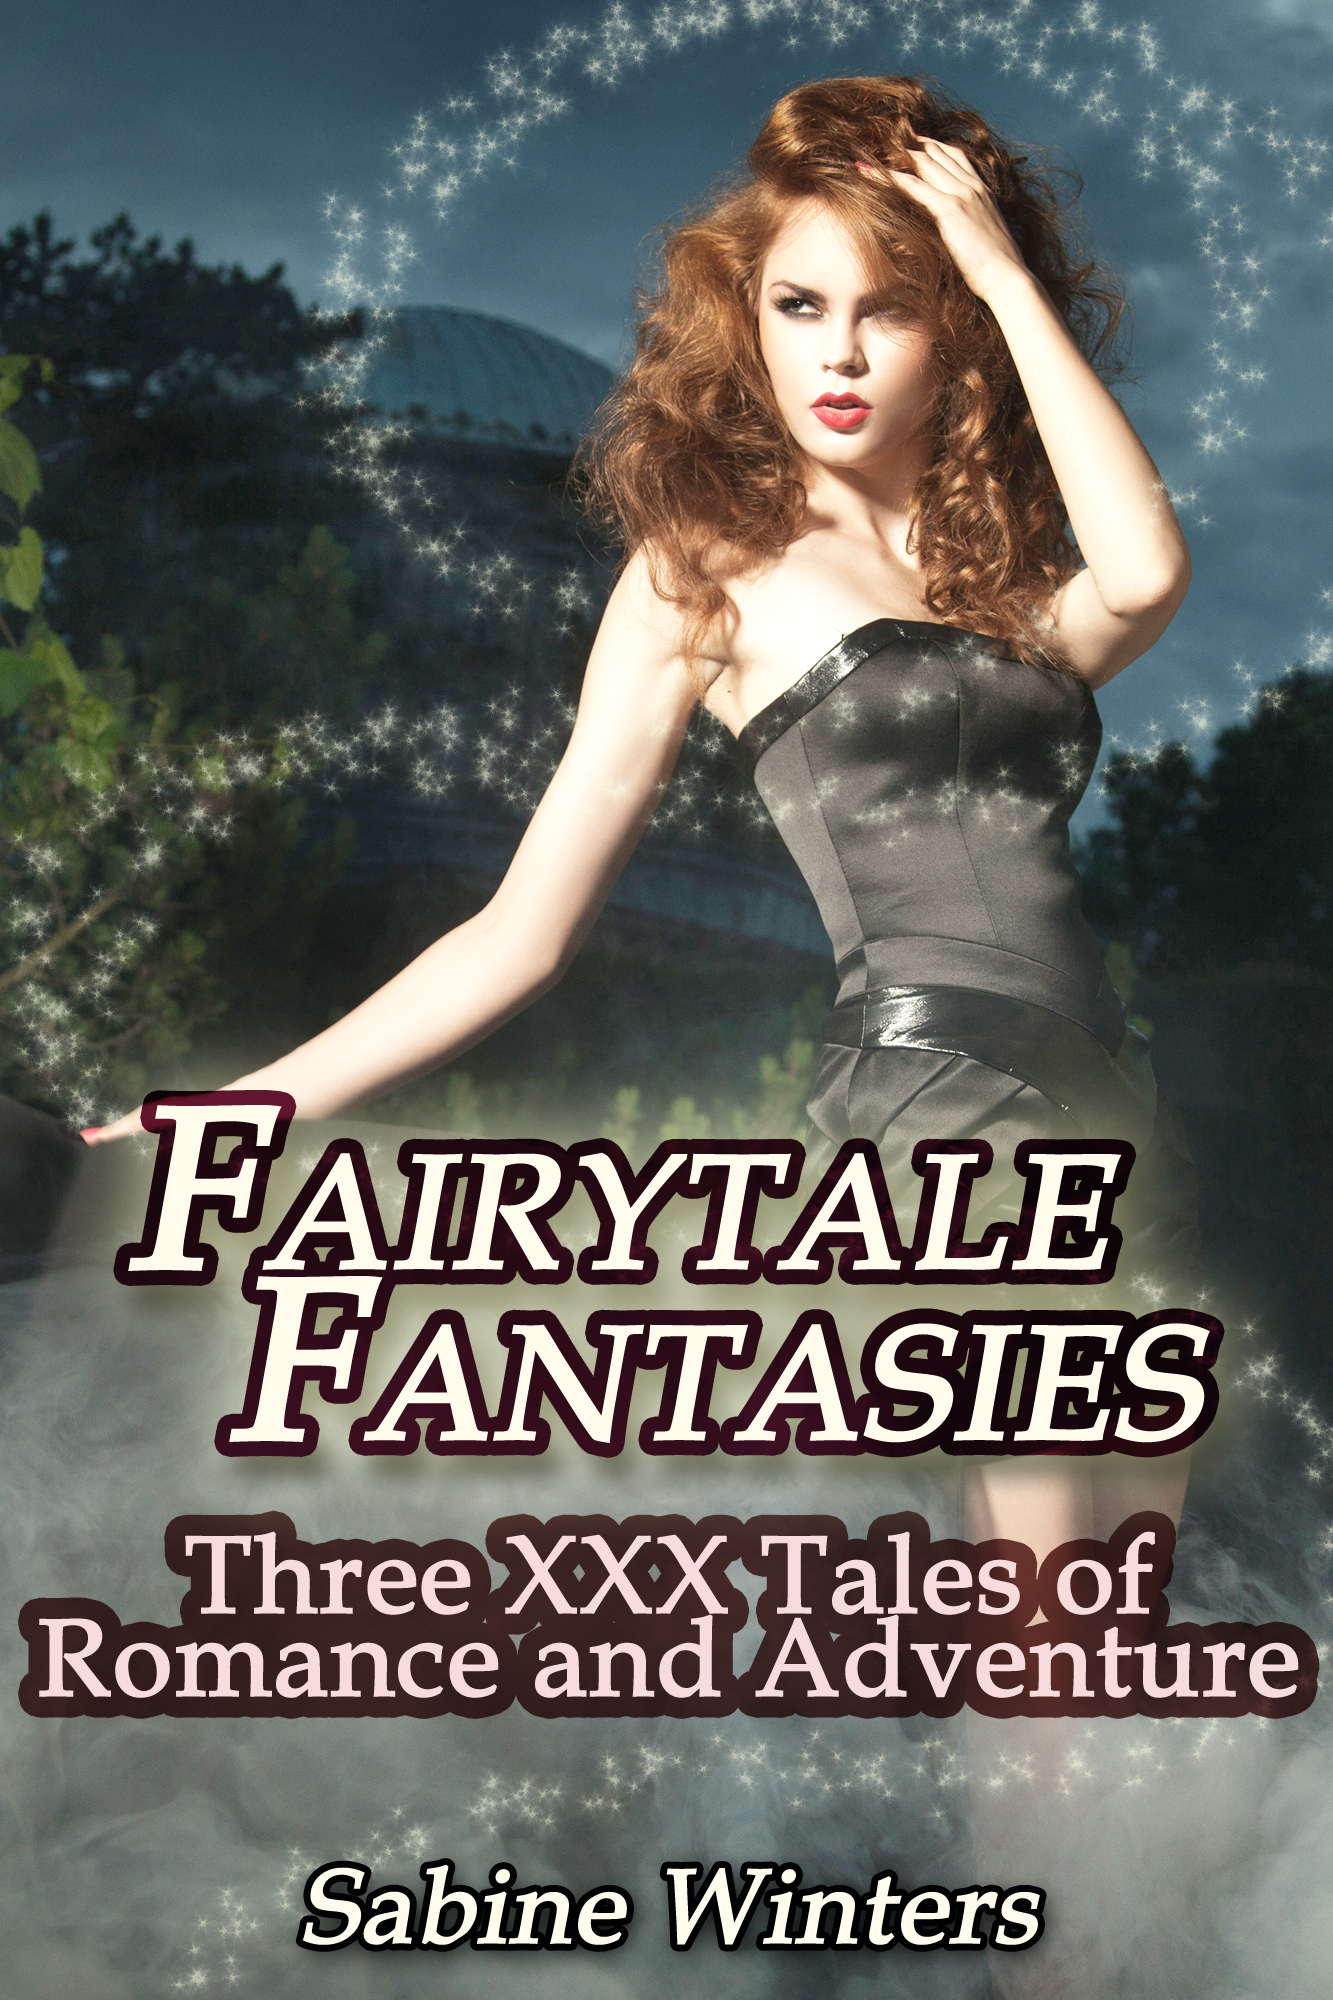 Fairytale erotica xxx movies